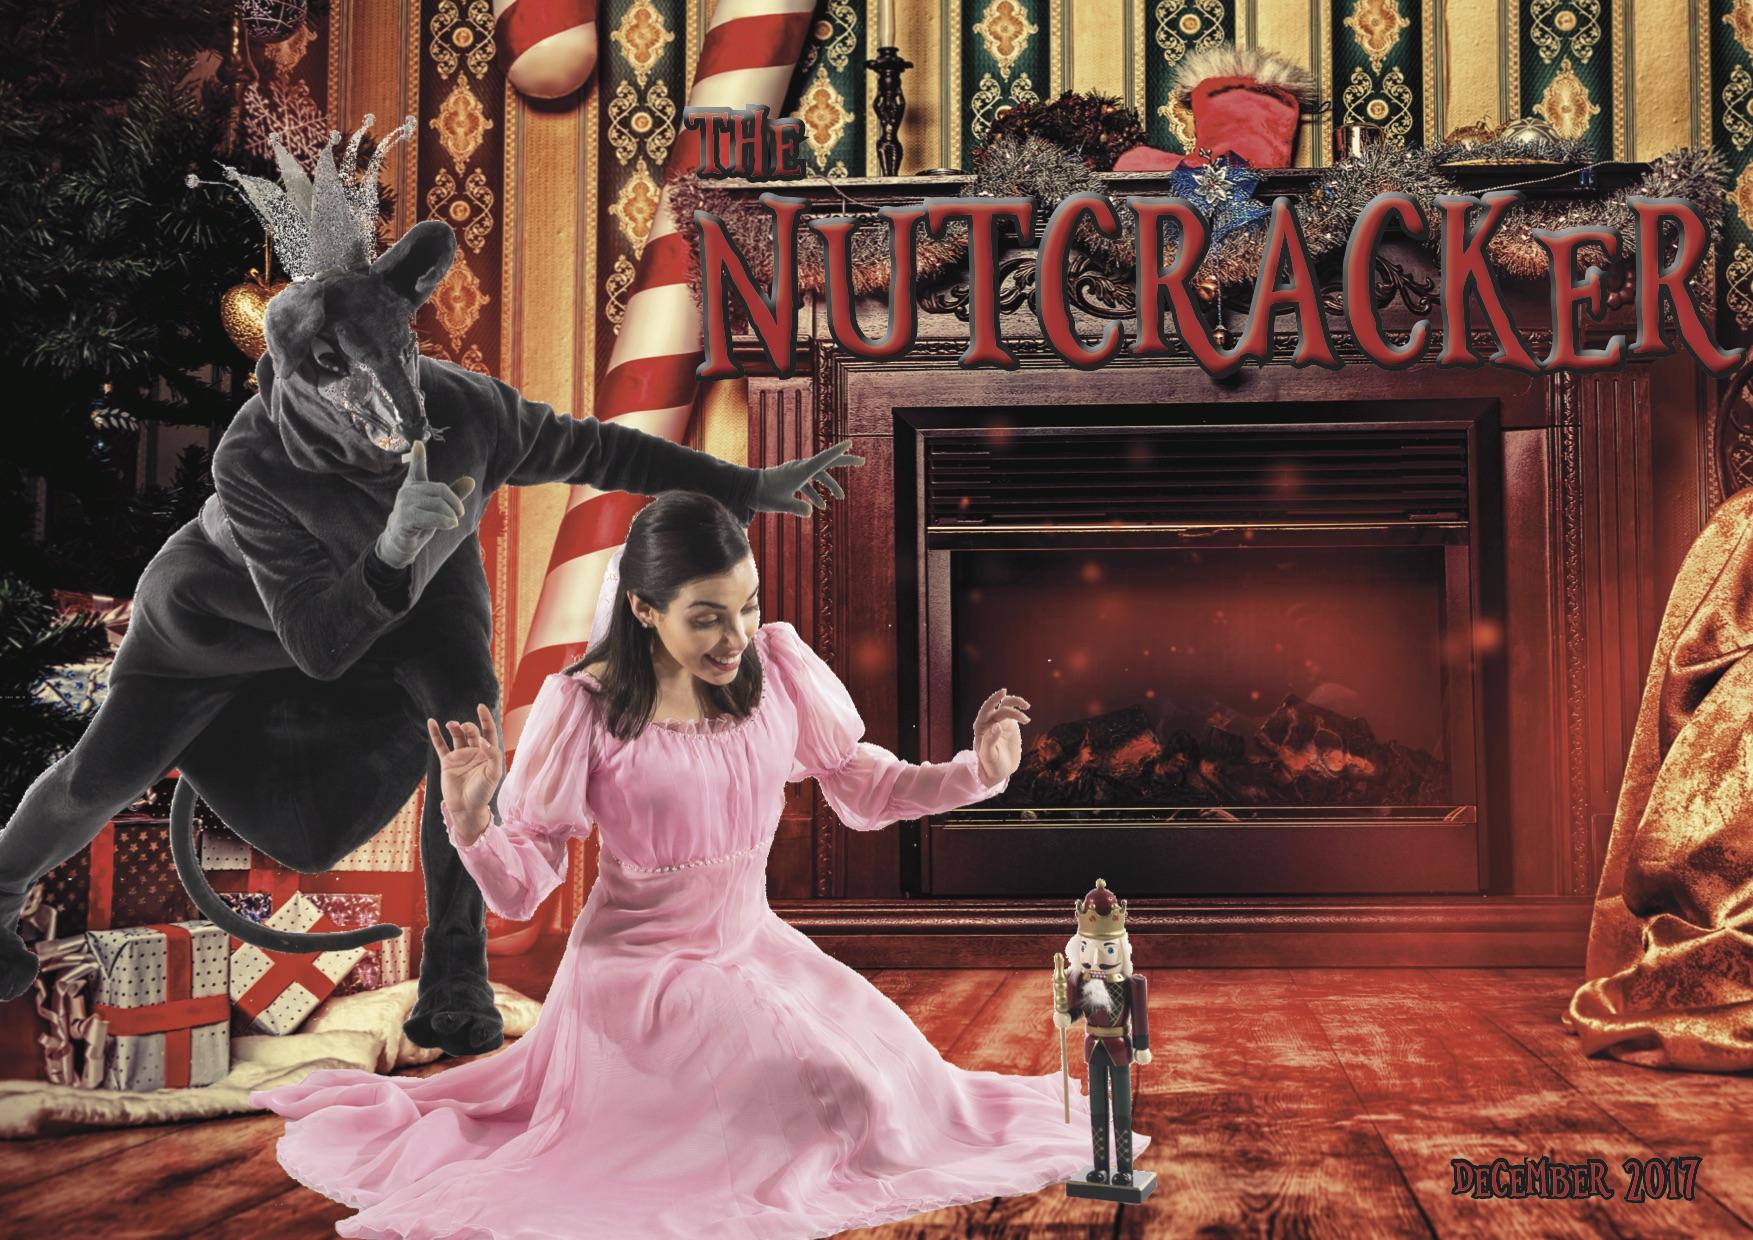 Melbourne City Ballet Presents - The Nutcracker